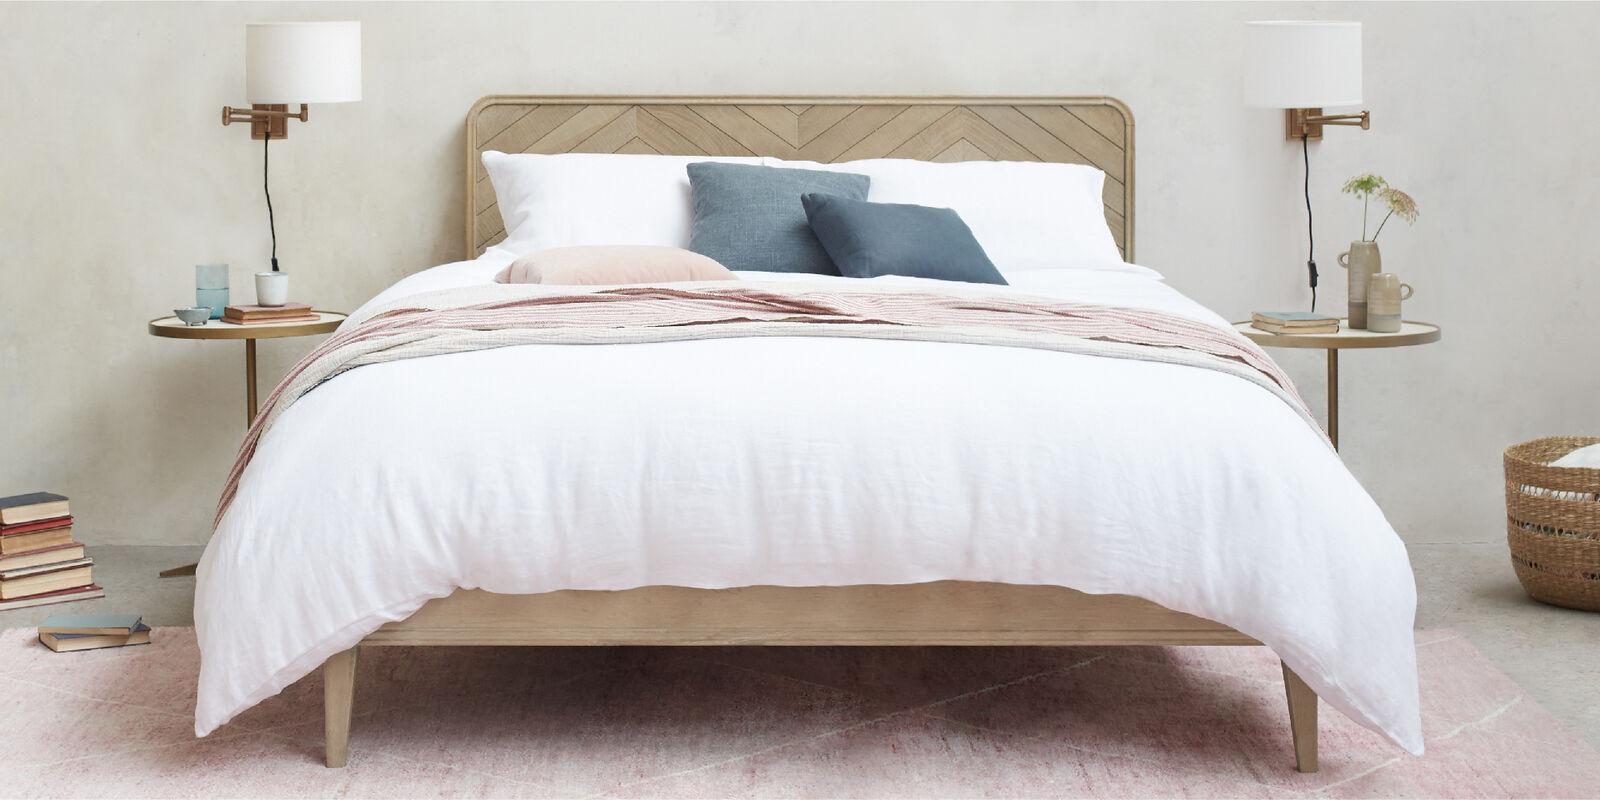 Flapper bed Wooden Bed